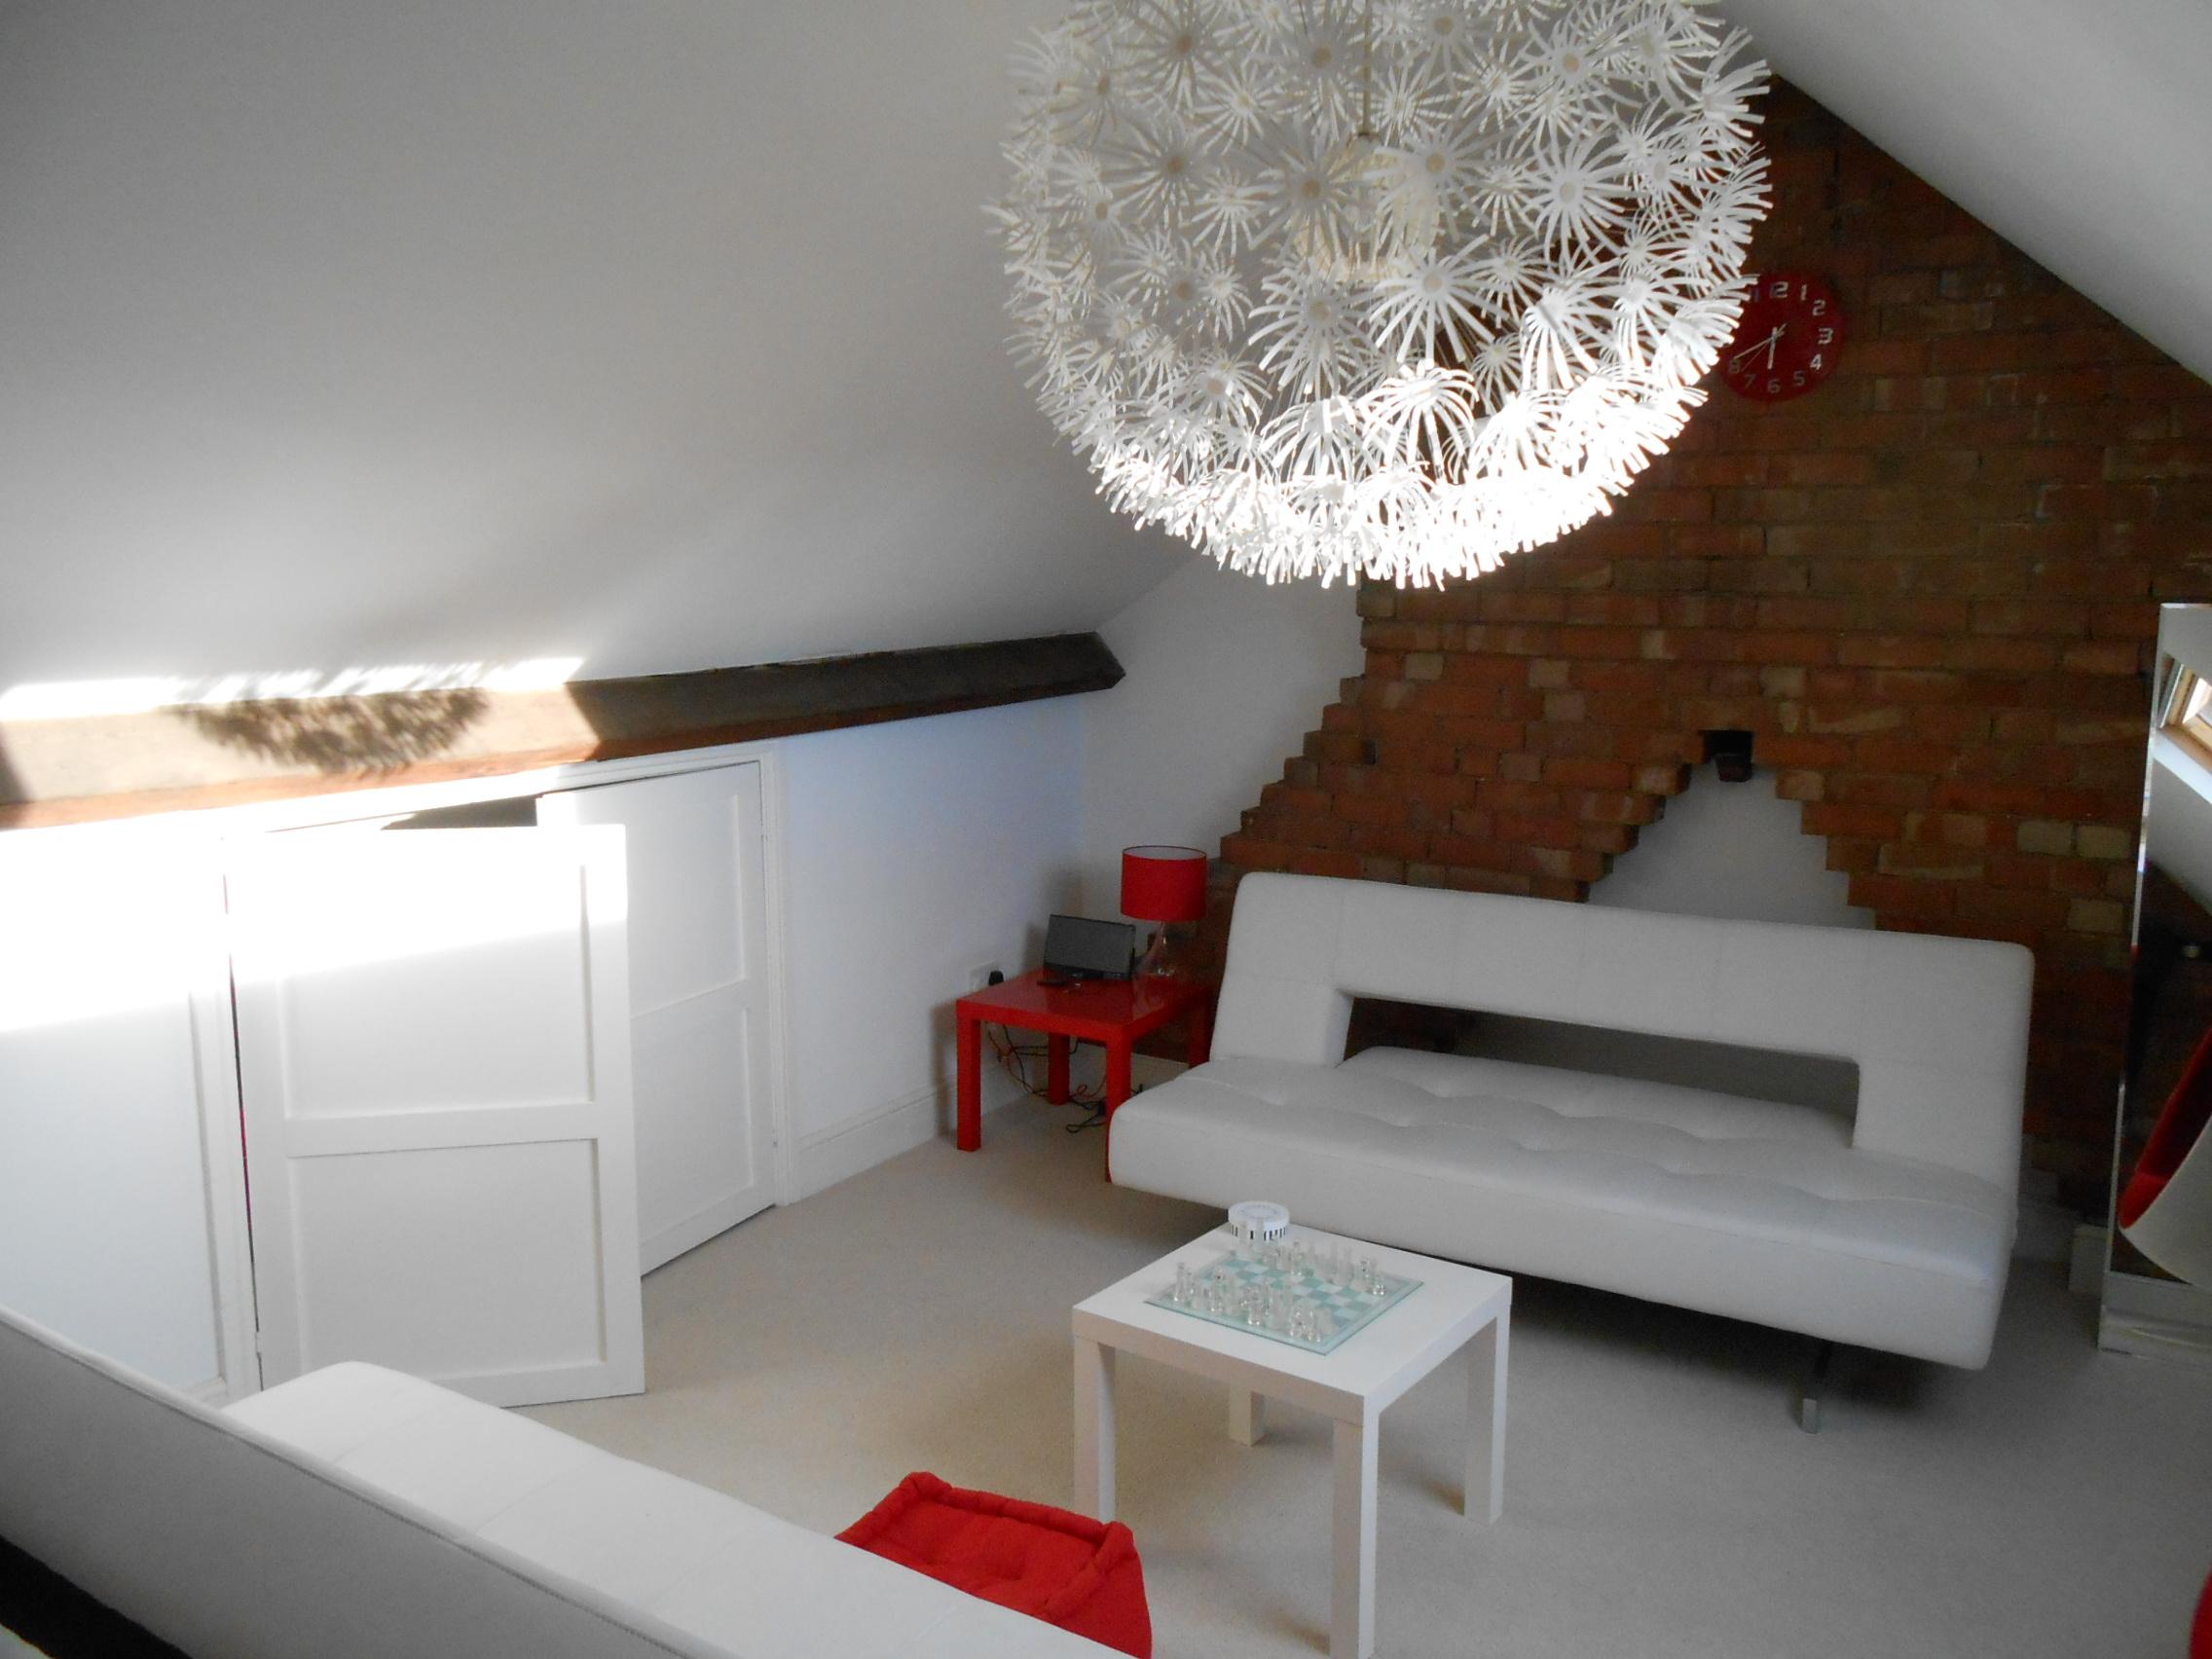 Converting Your Loft